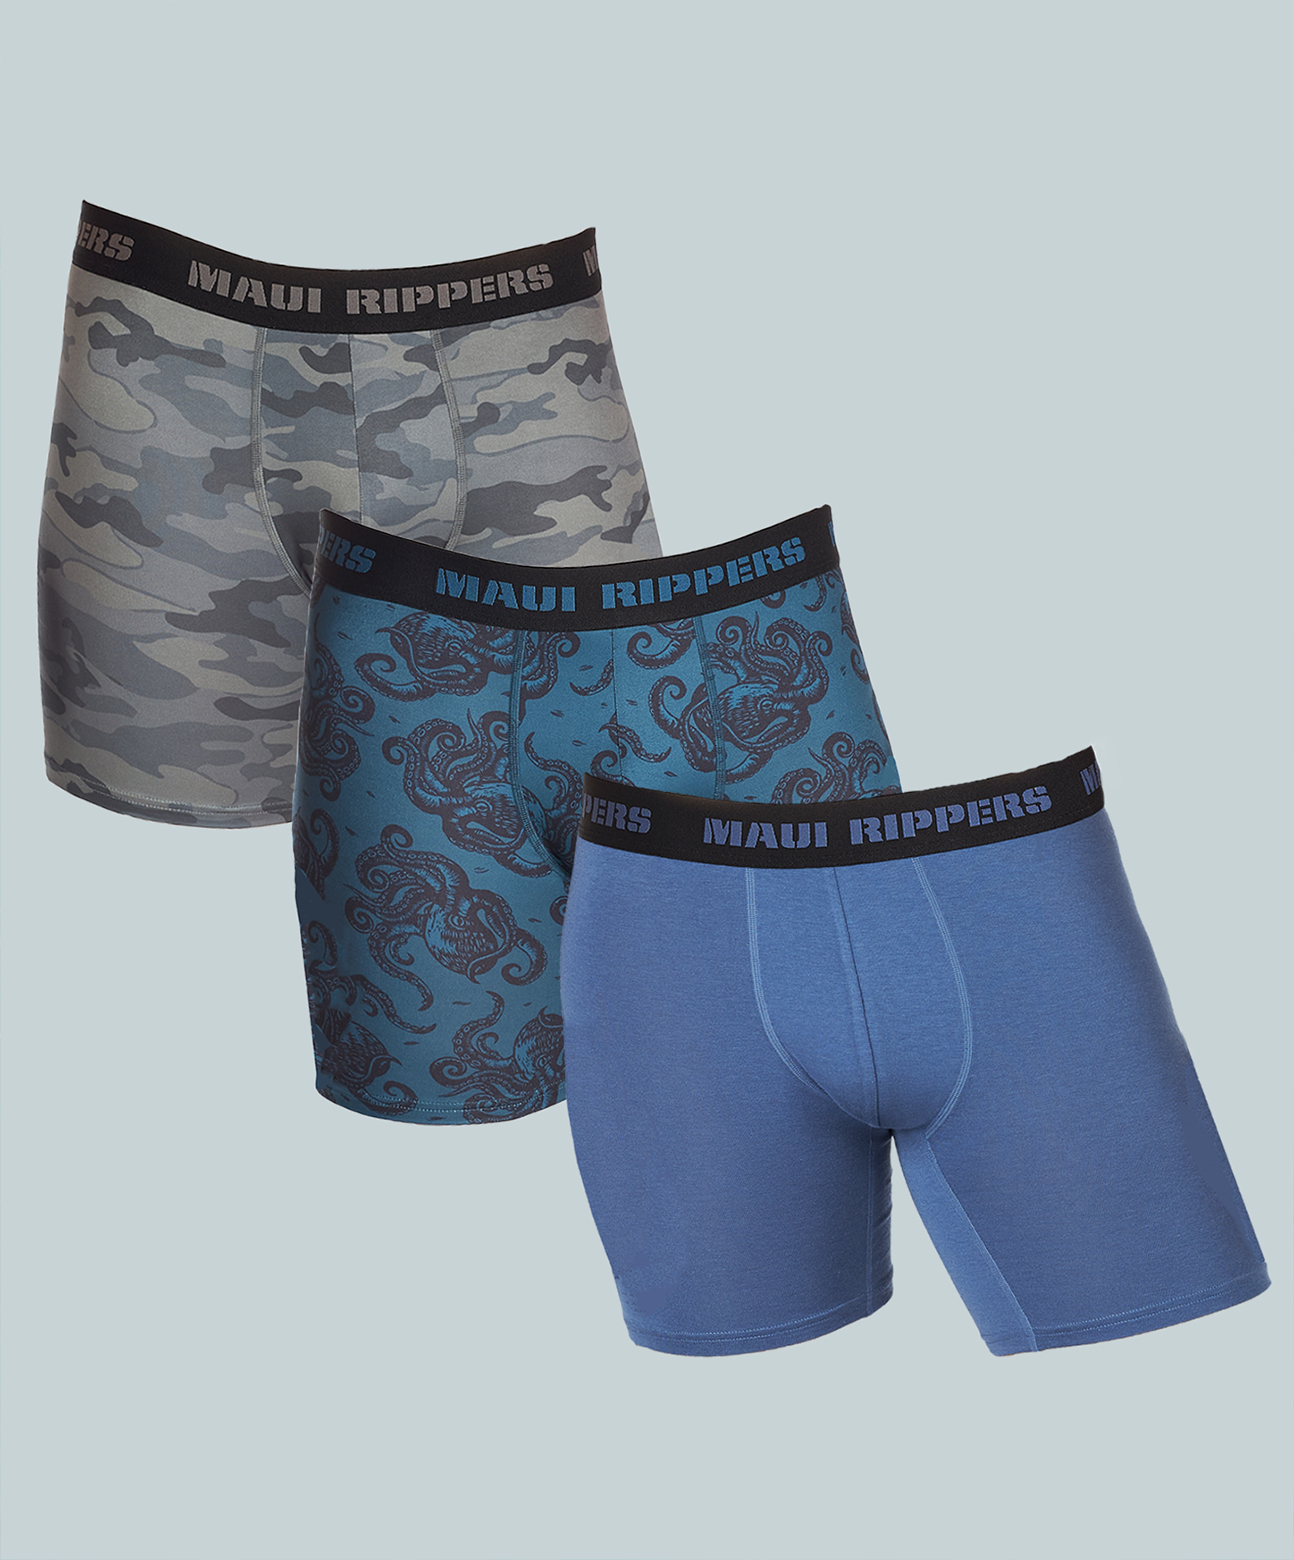 Maui Rippers men's underwear boxer briefs waterproof anti-odor and moisture wicking